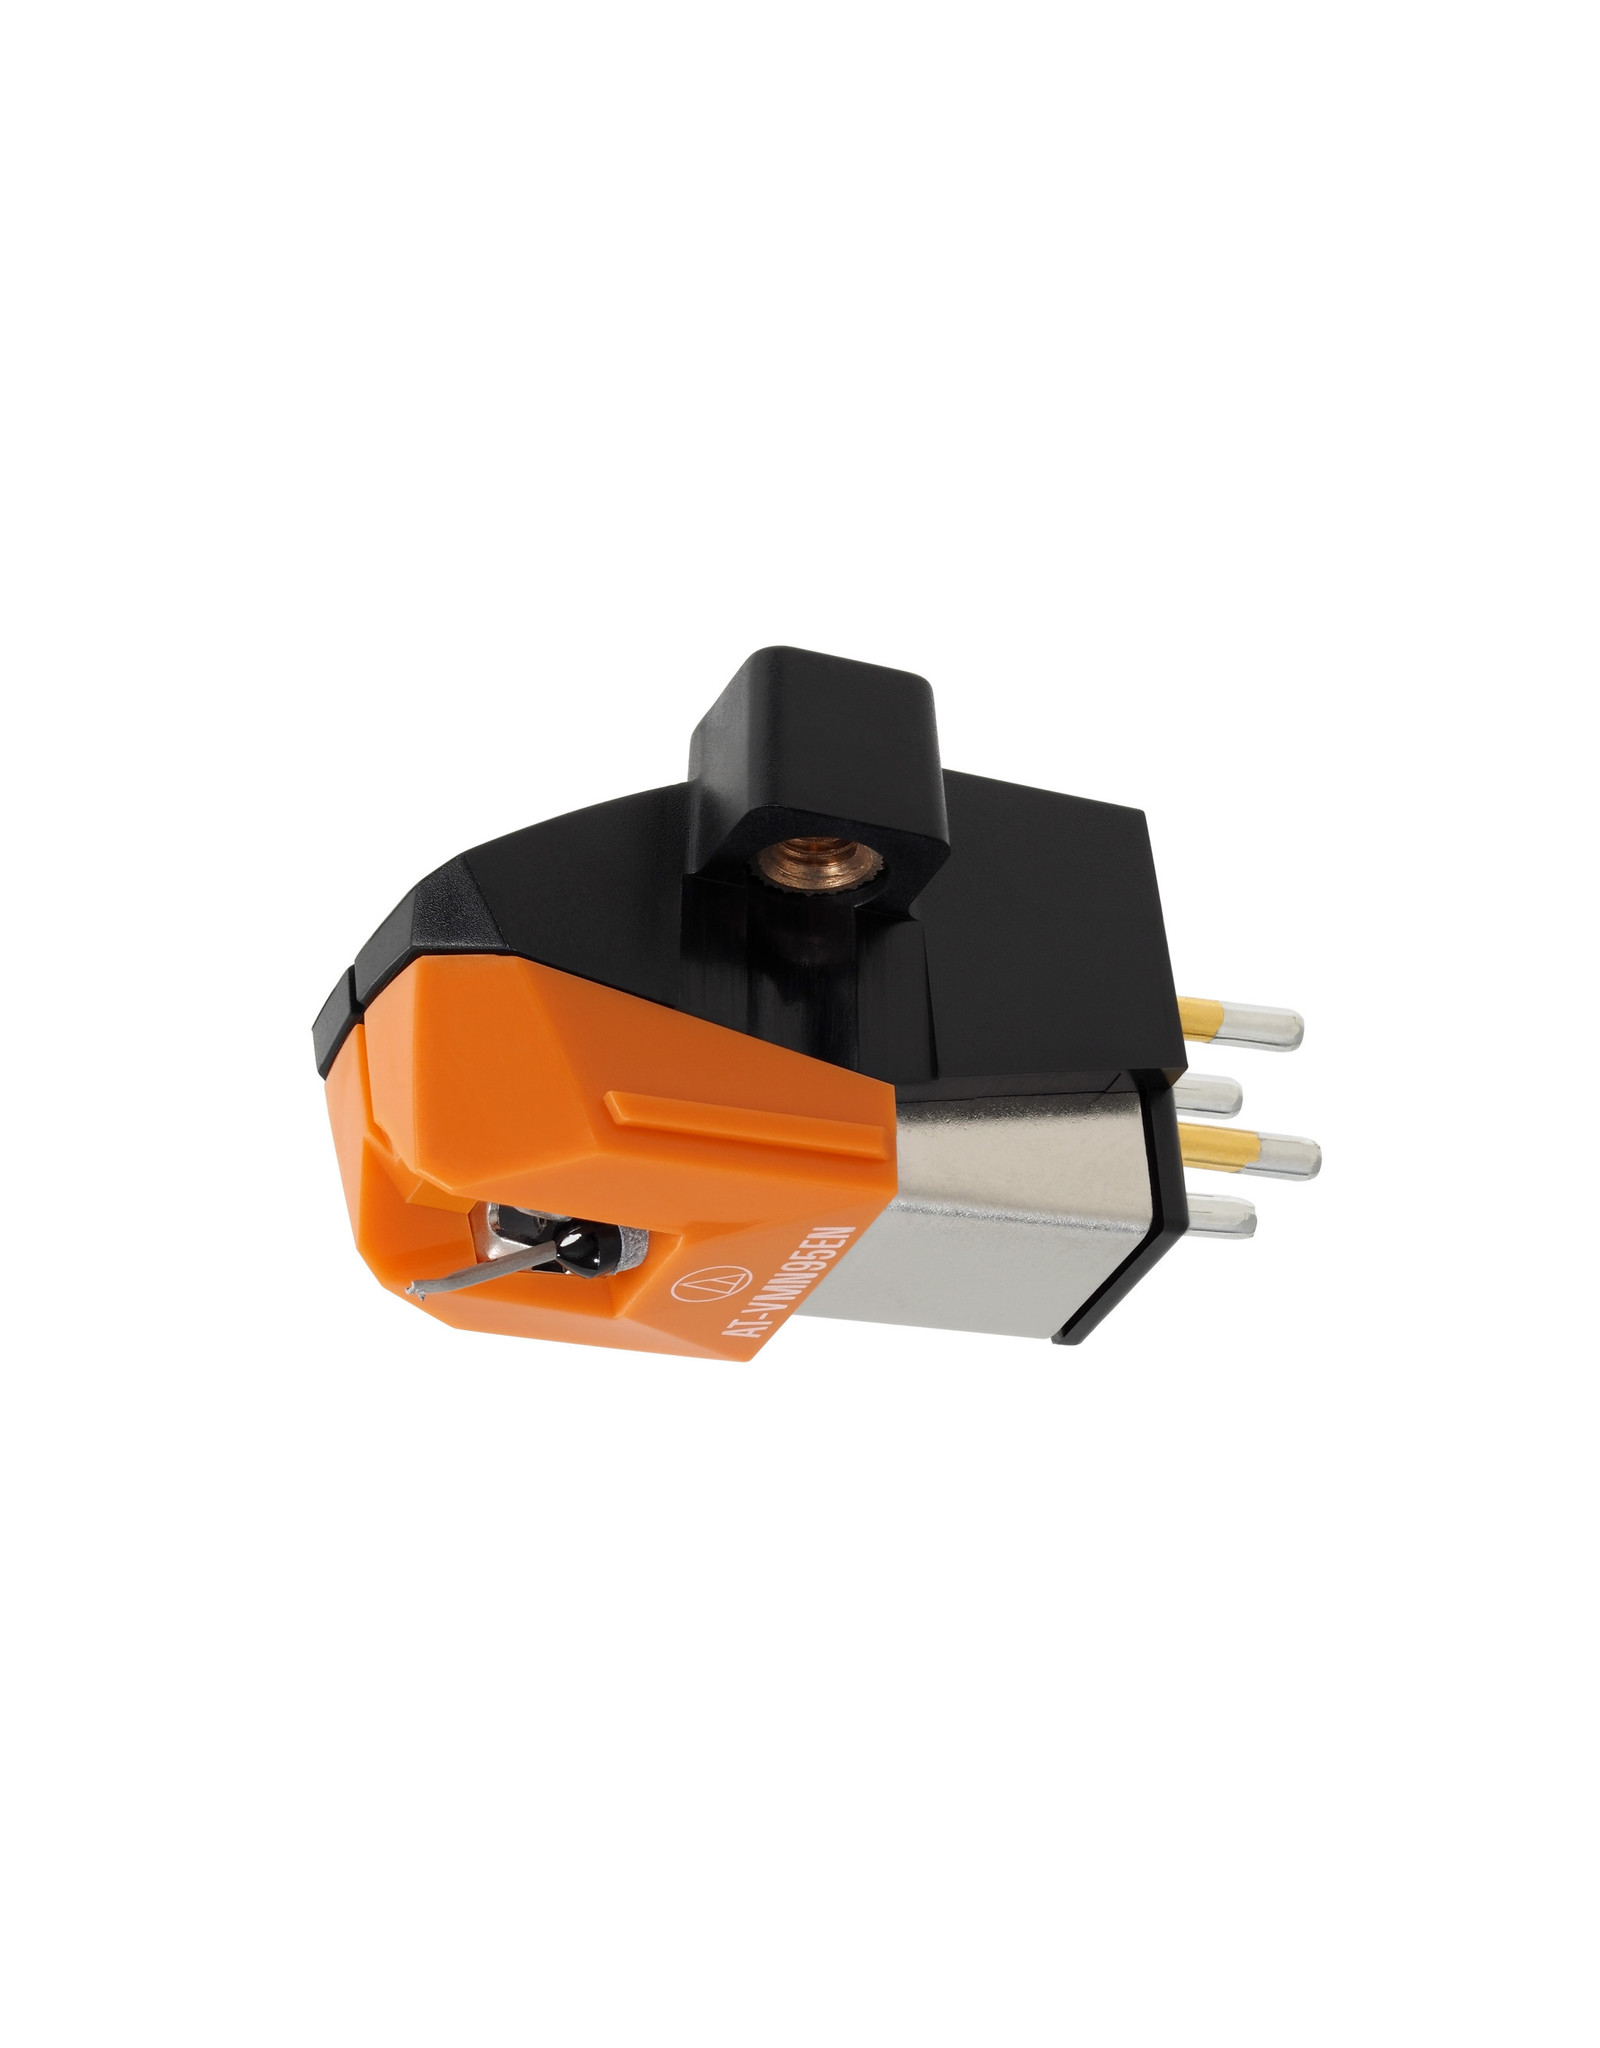 Audio-Technica Audio-Technica AT-VM95EN Phono Cartridge